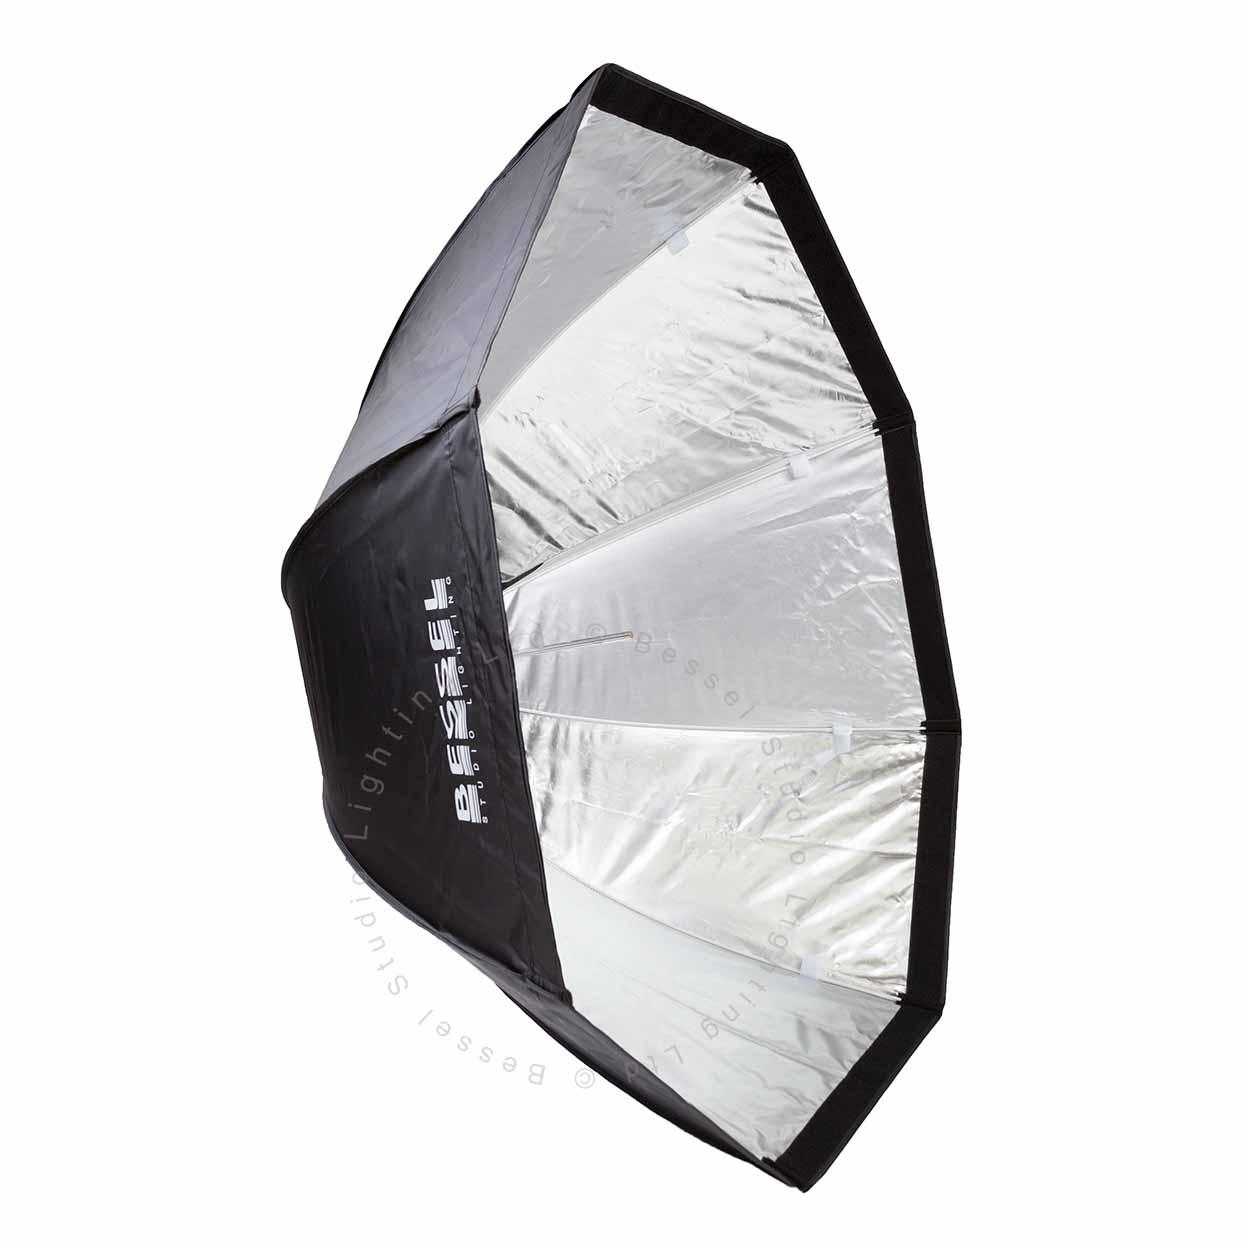 Umbrella Like A Softbox: Bessel 120cm Octabox Softbox + 2 Diffusers & 4cm Grid